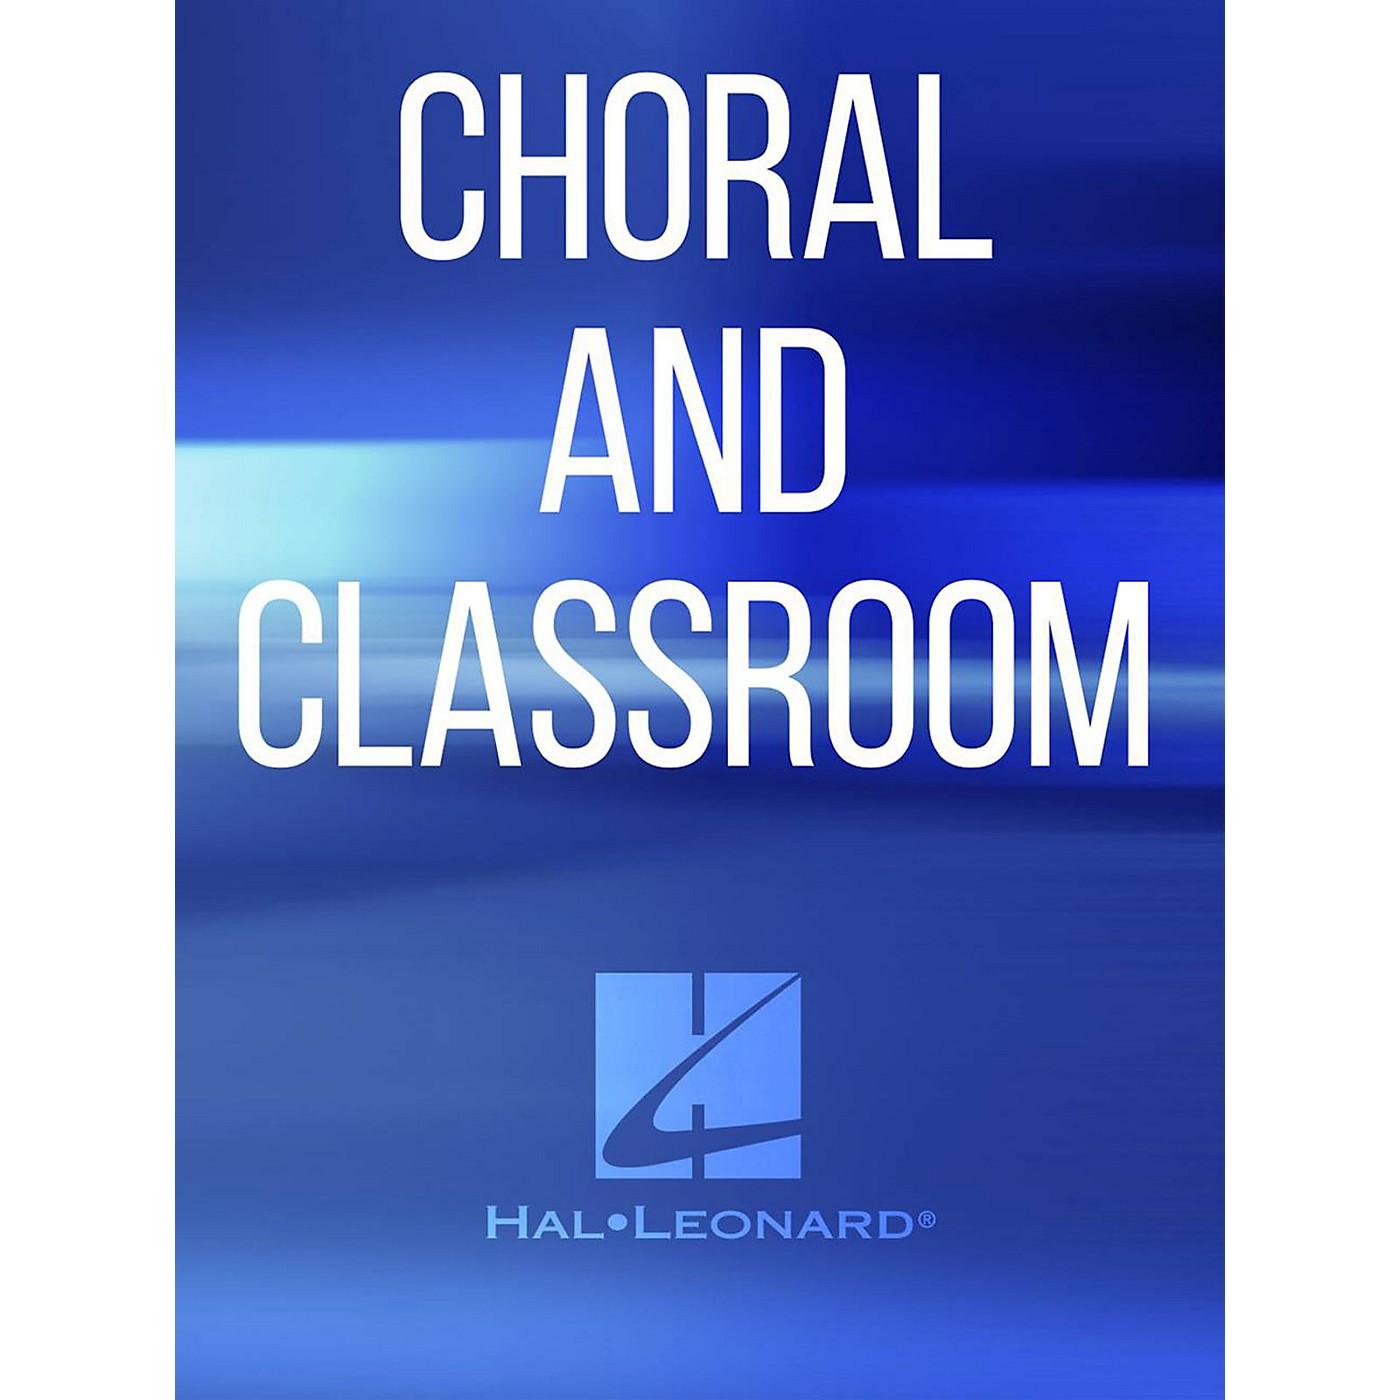 Hal Leonard Sally Gardens SATB Composed by William Hall thumbnail